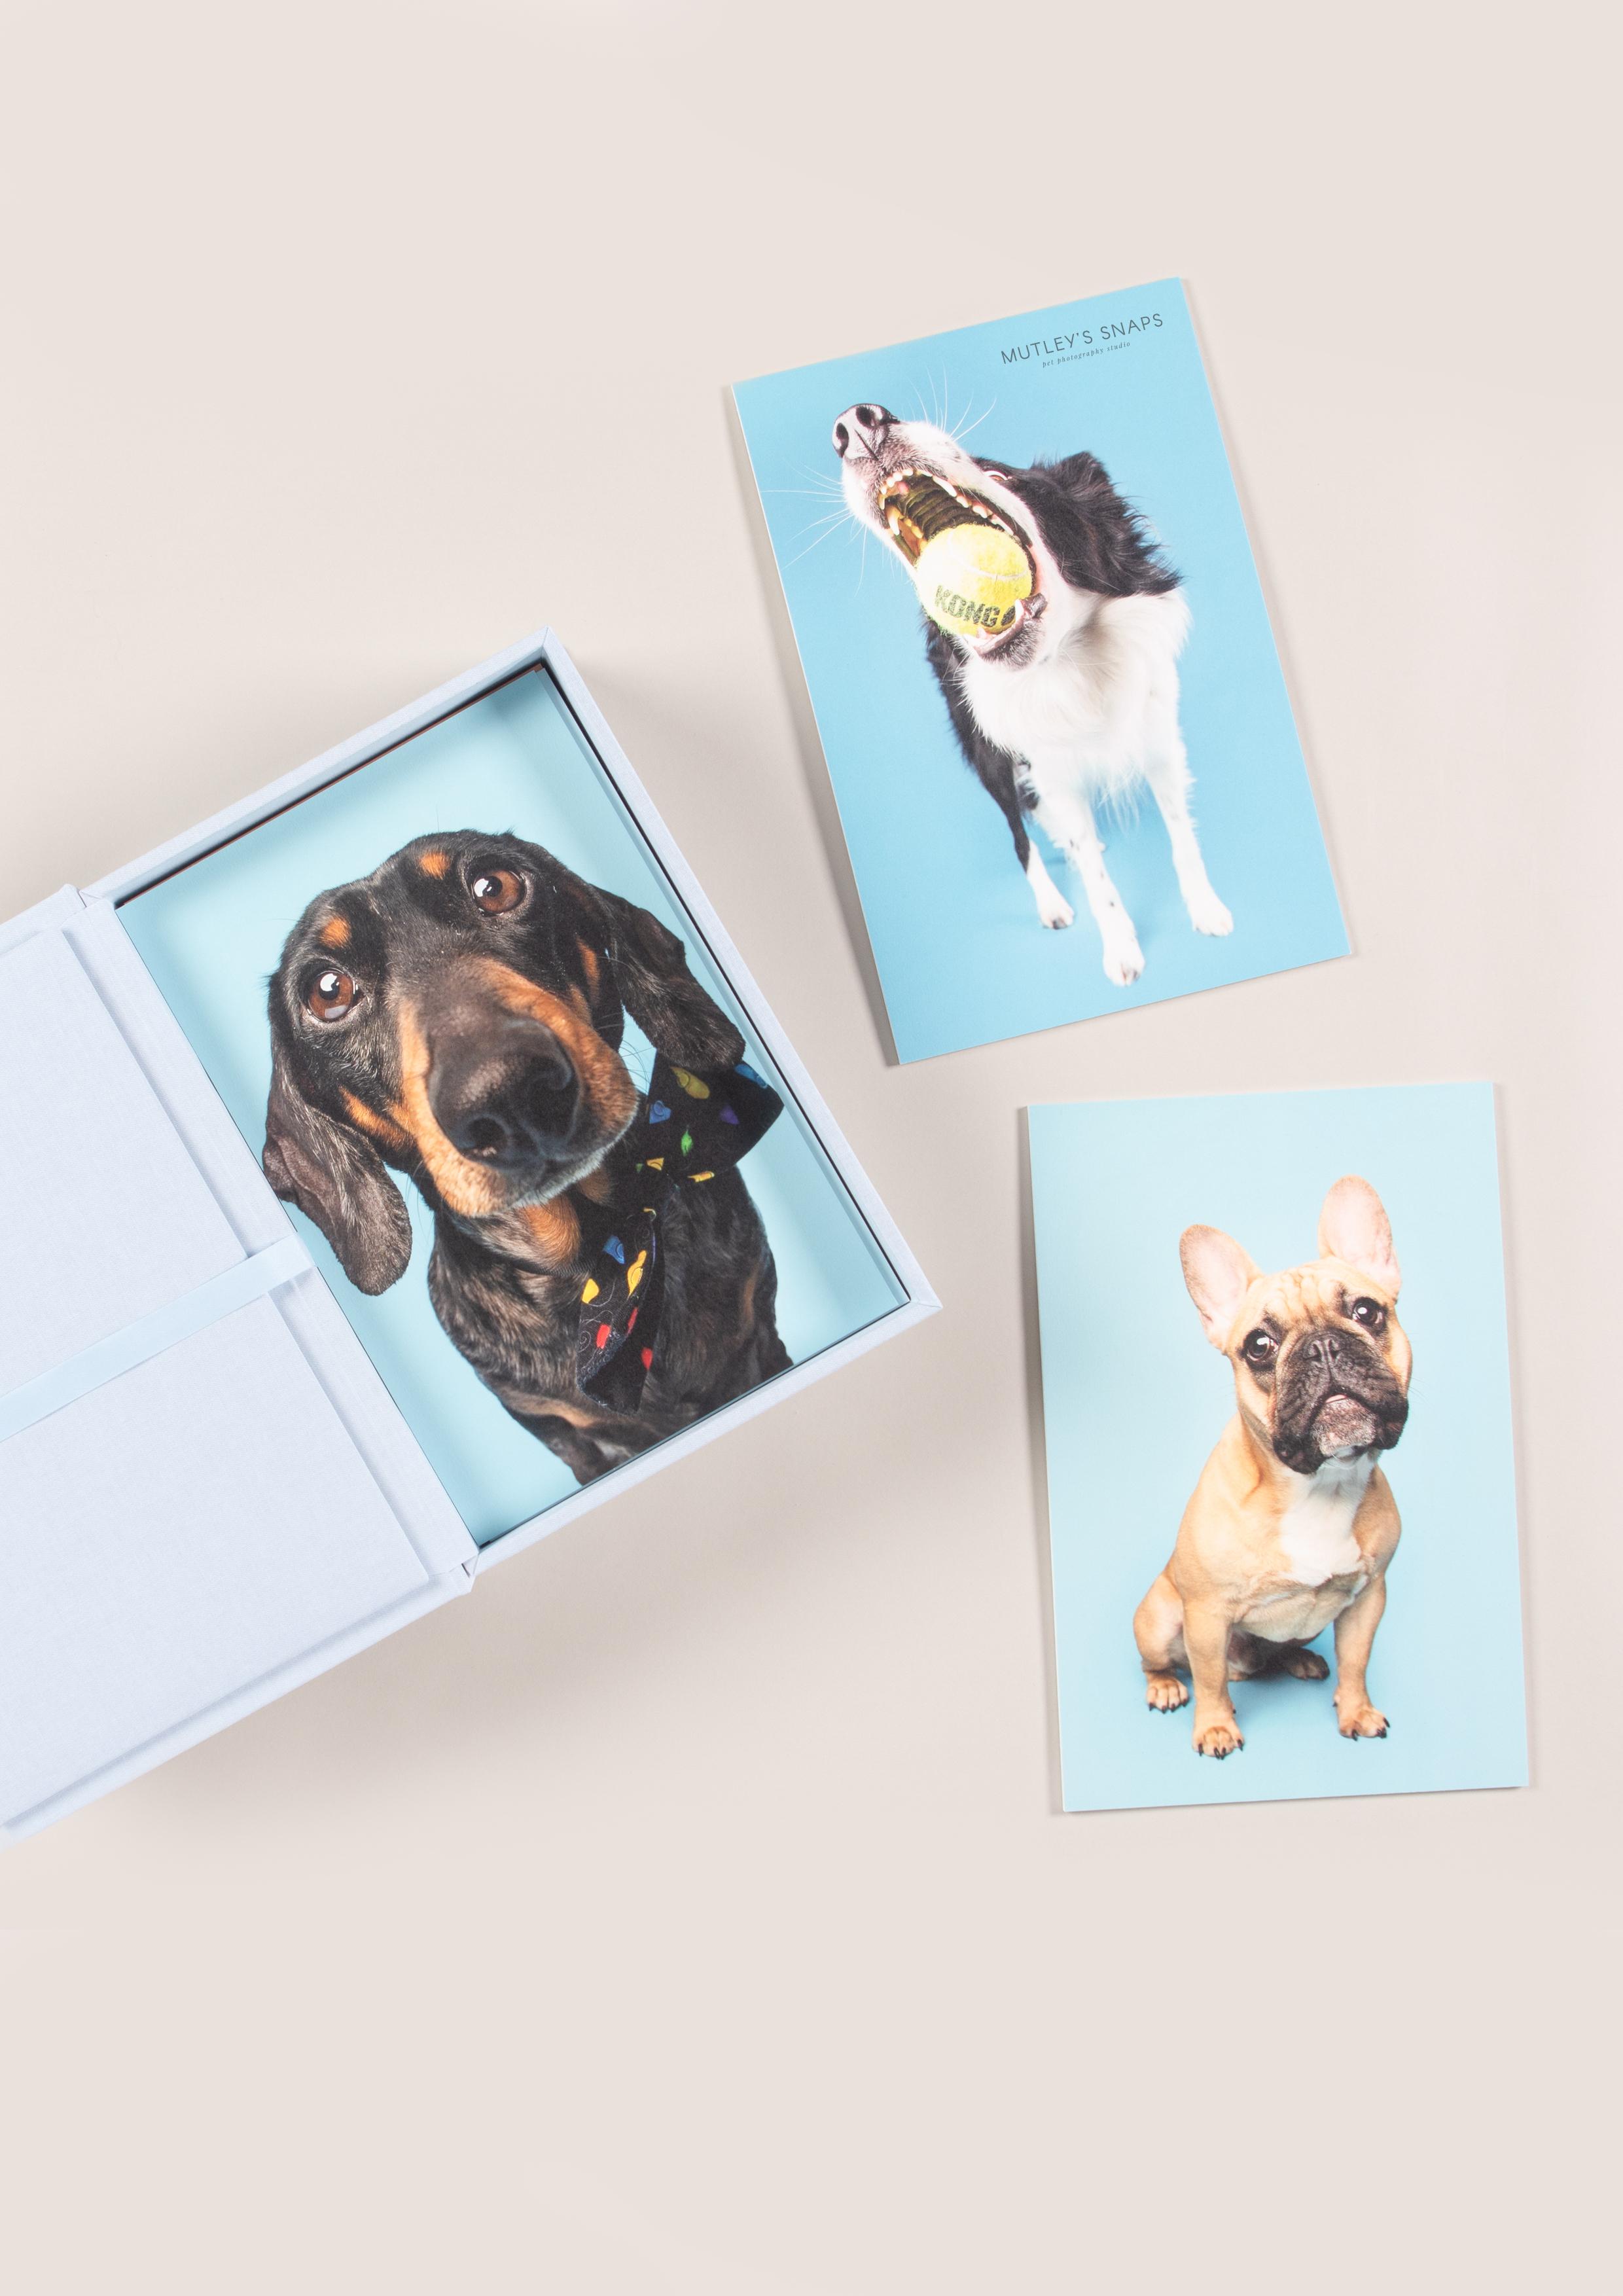 animal portraits in professional prints